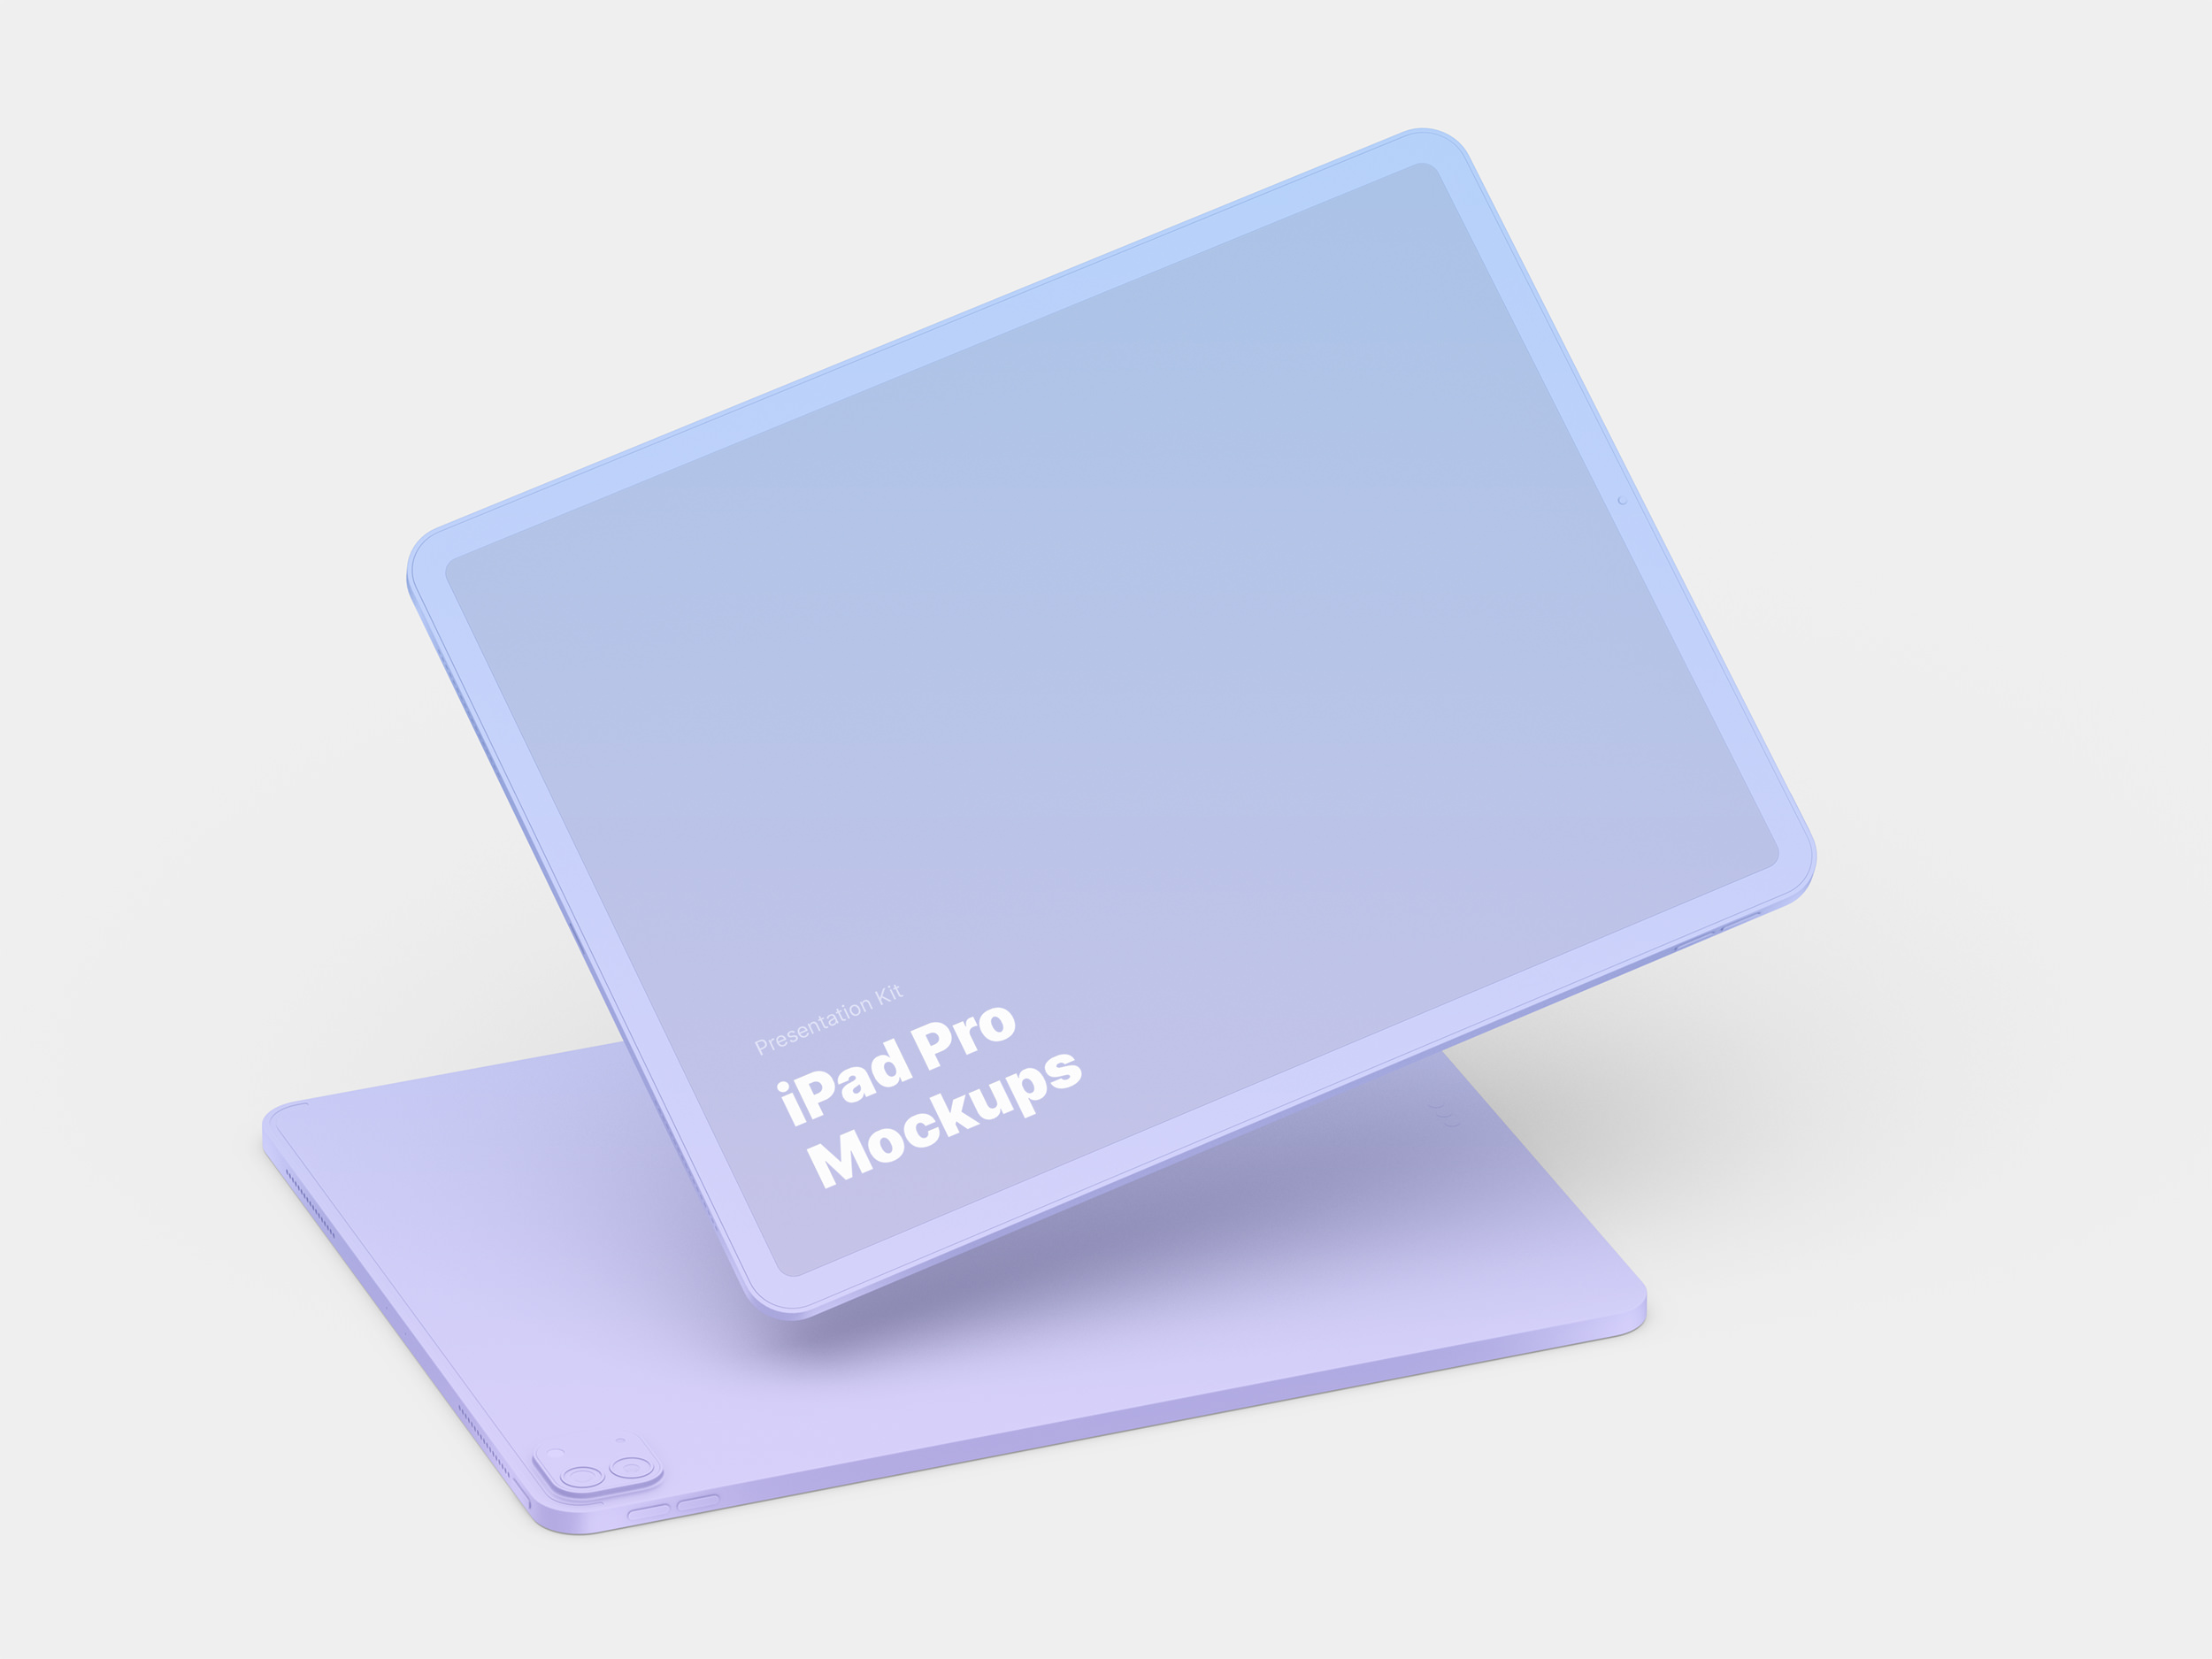 iPad Pro (2020) Mockups